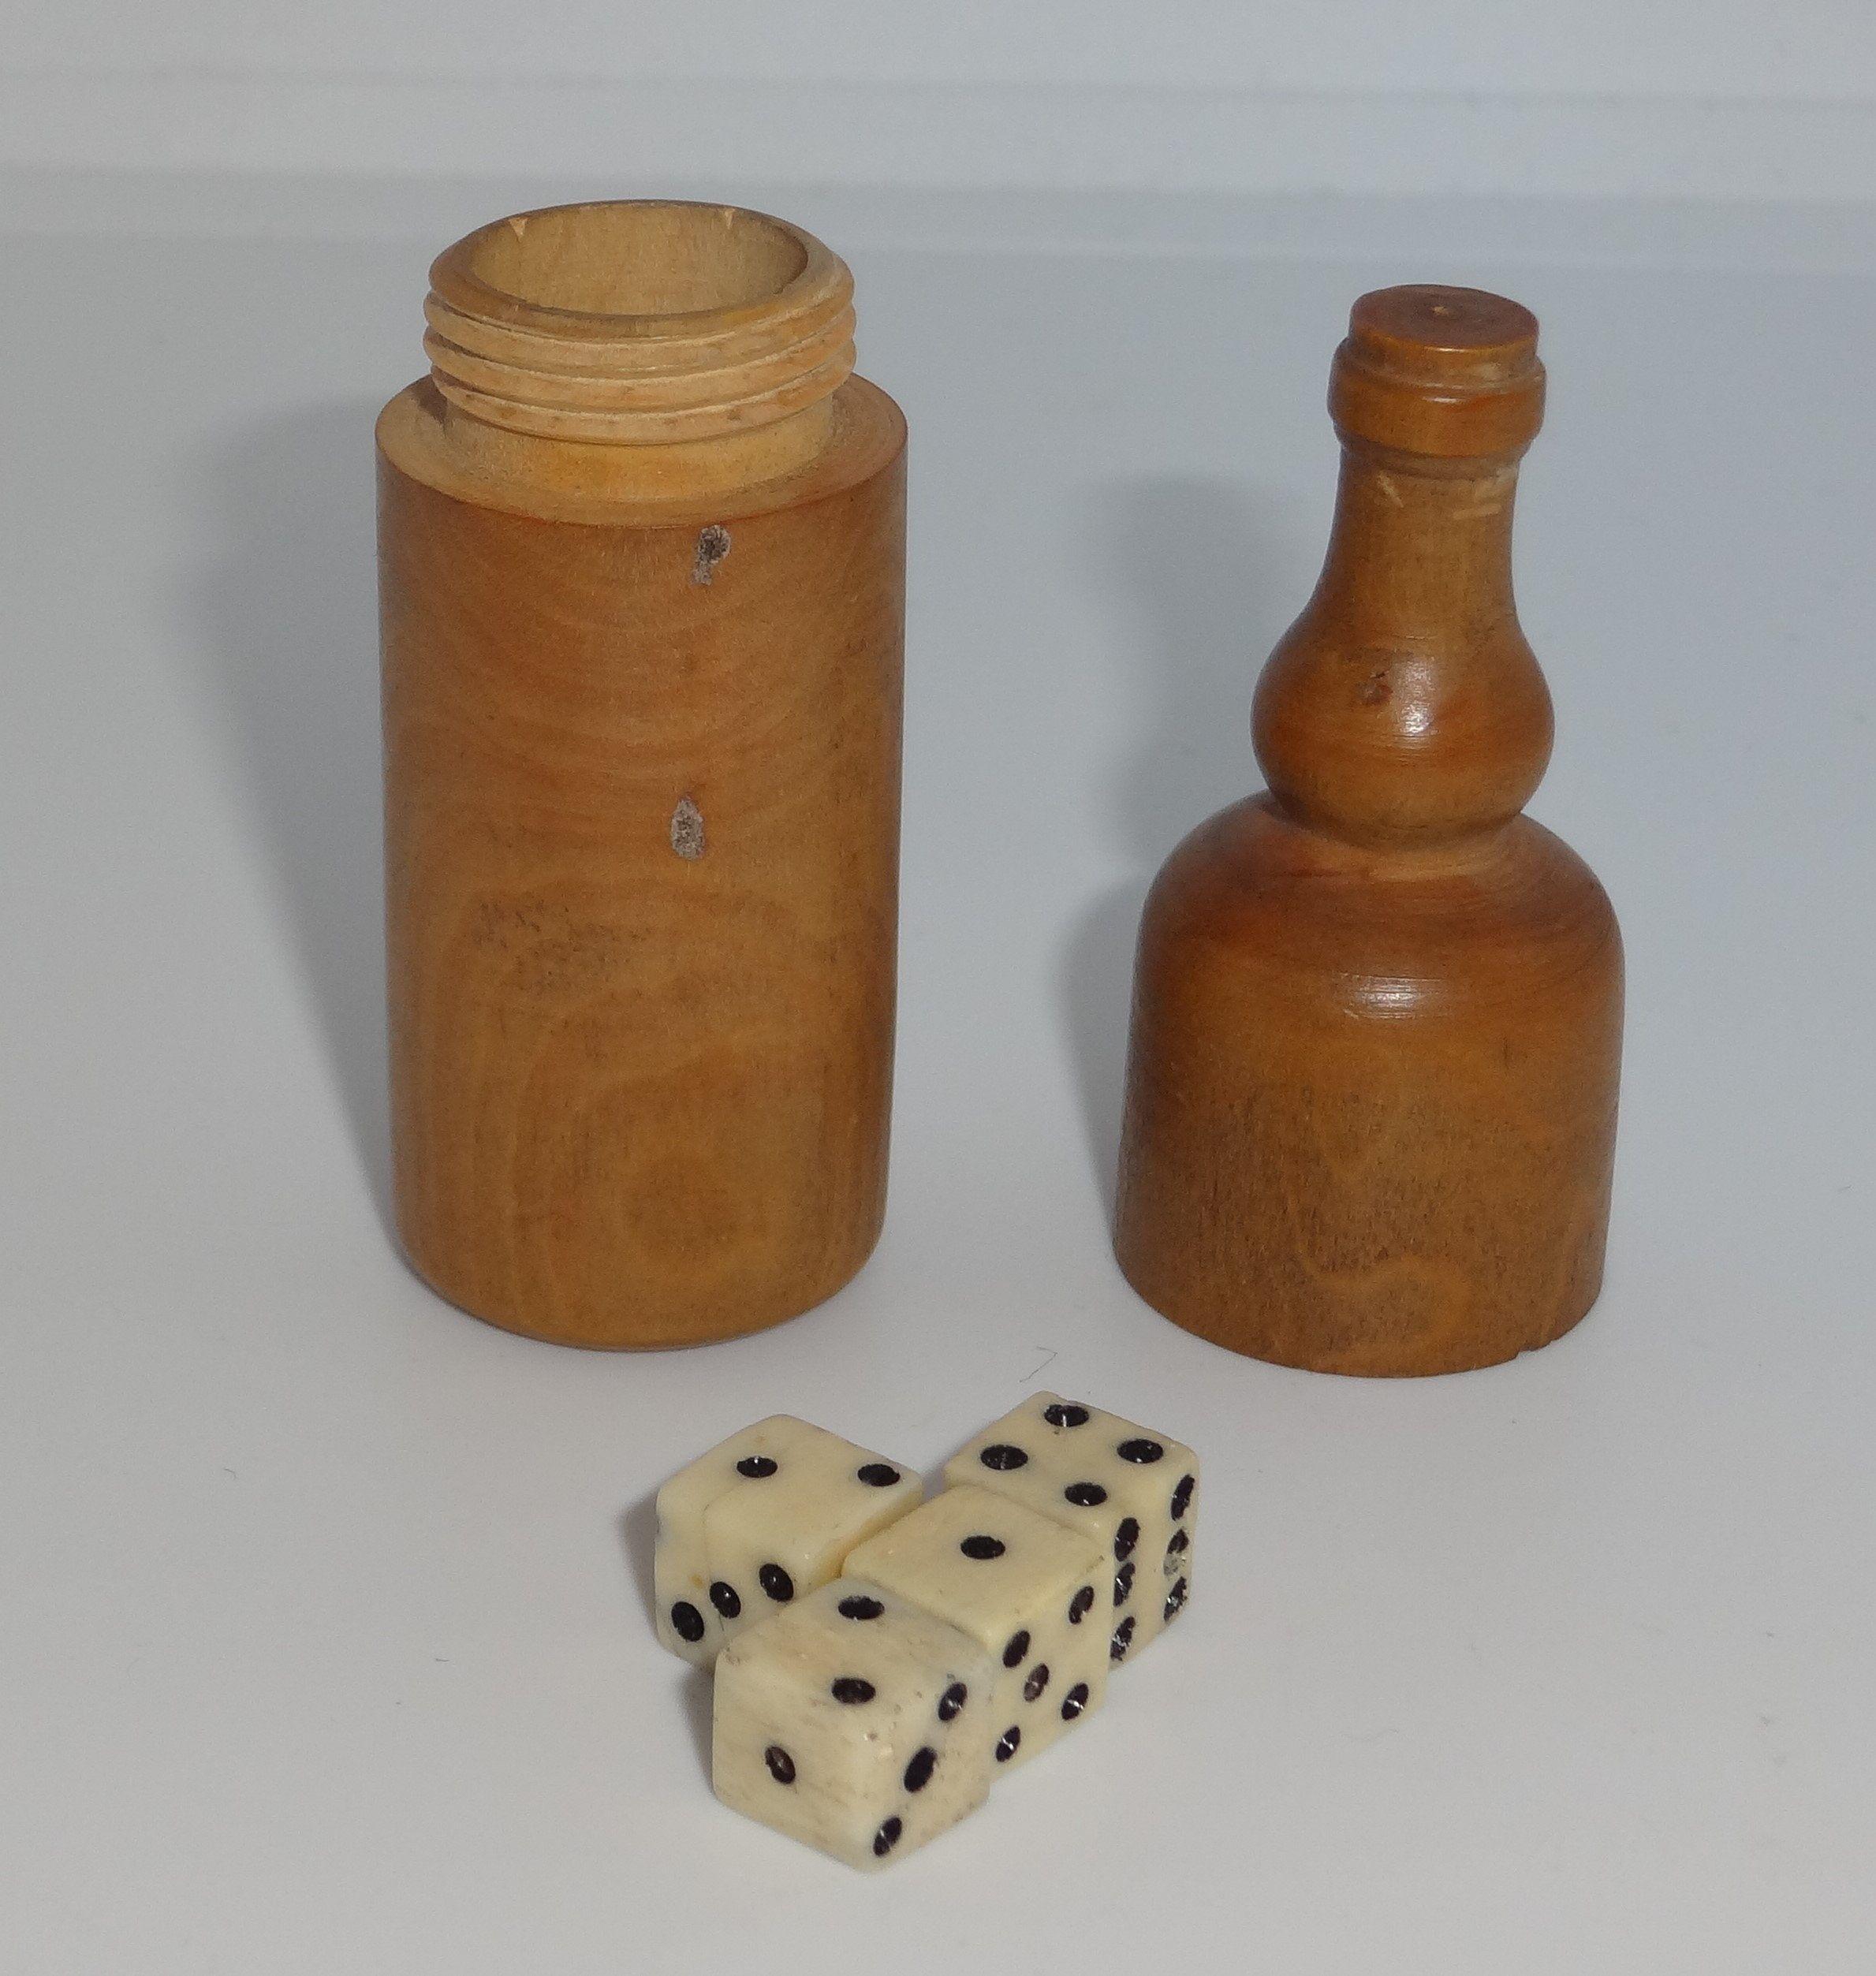 Antique Treen Bottle Shaped Dice Shaker Screw Lid With 4 Tiny Etsy Bottle Shapes Shaker Bottle